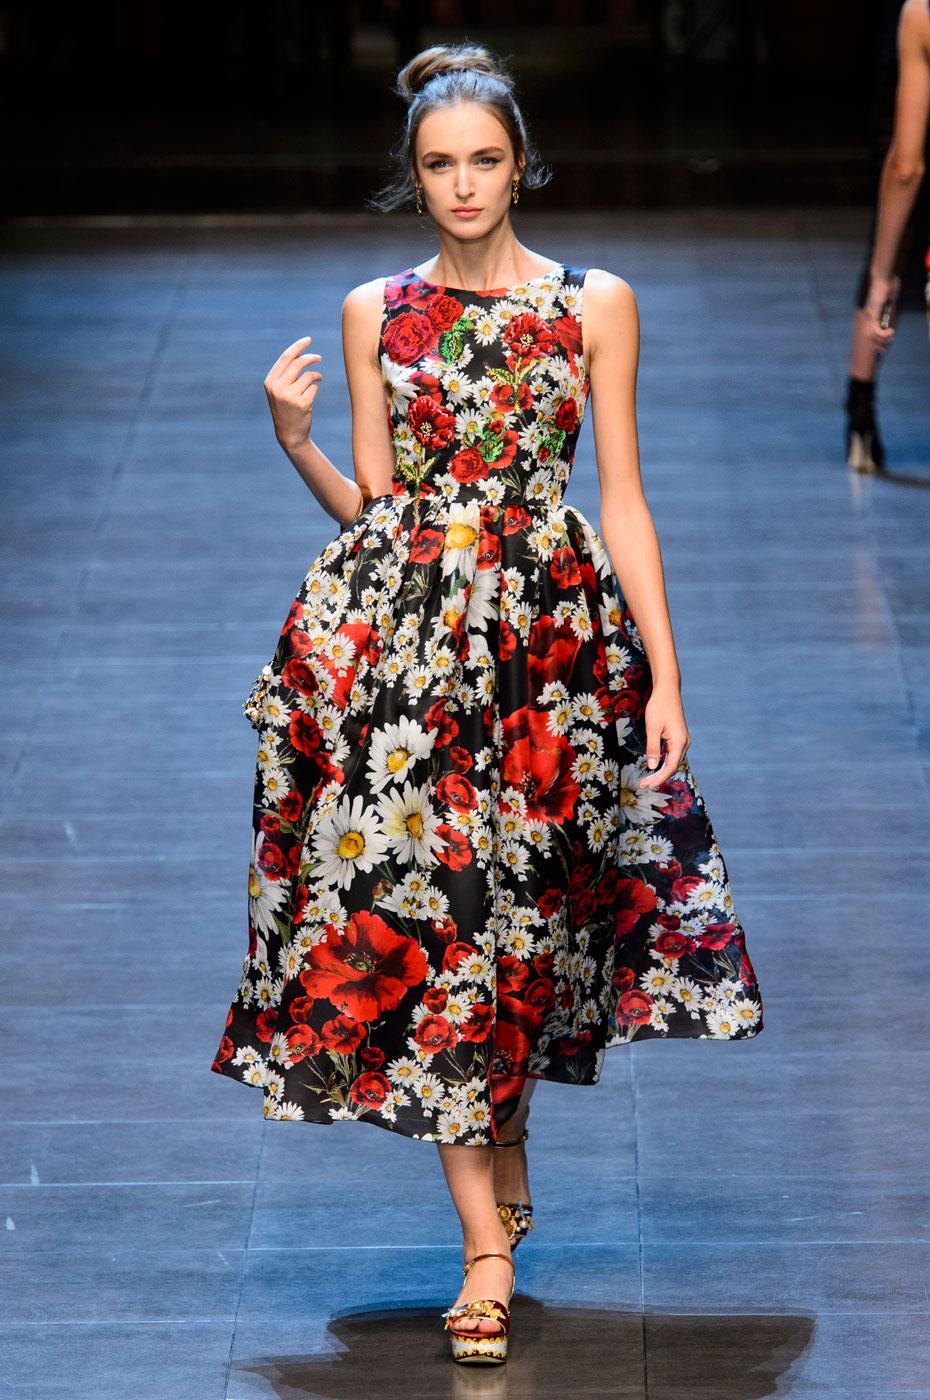 Dolce&Gabbana-Floral-Prints-Runway